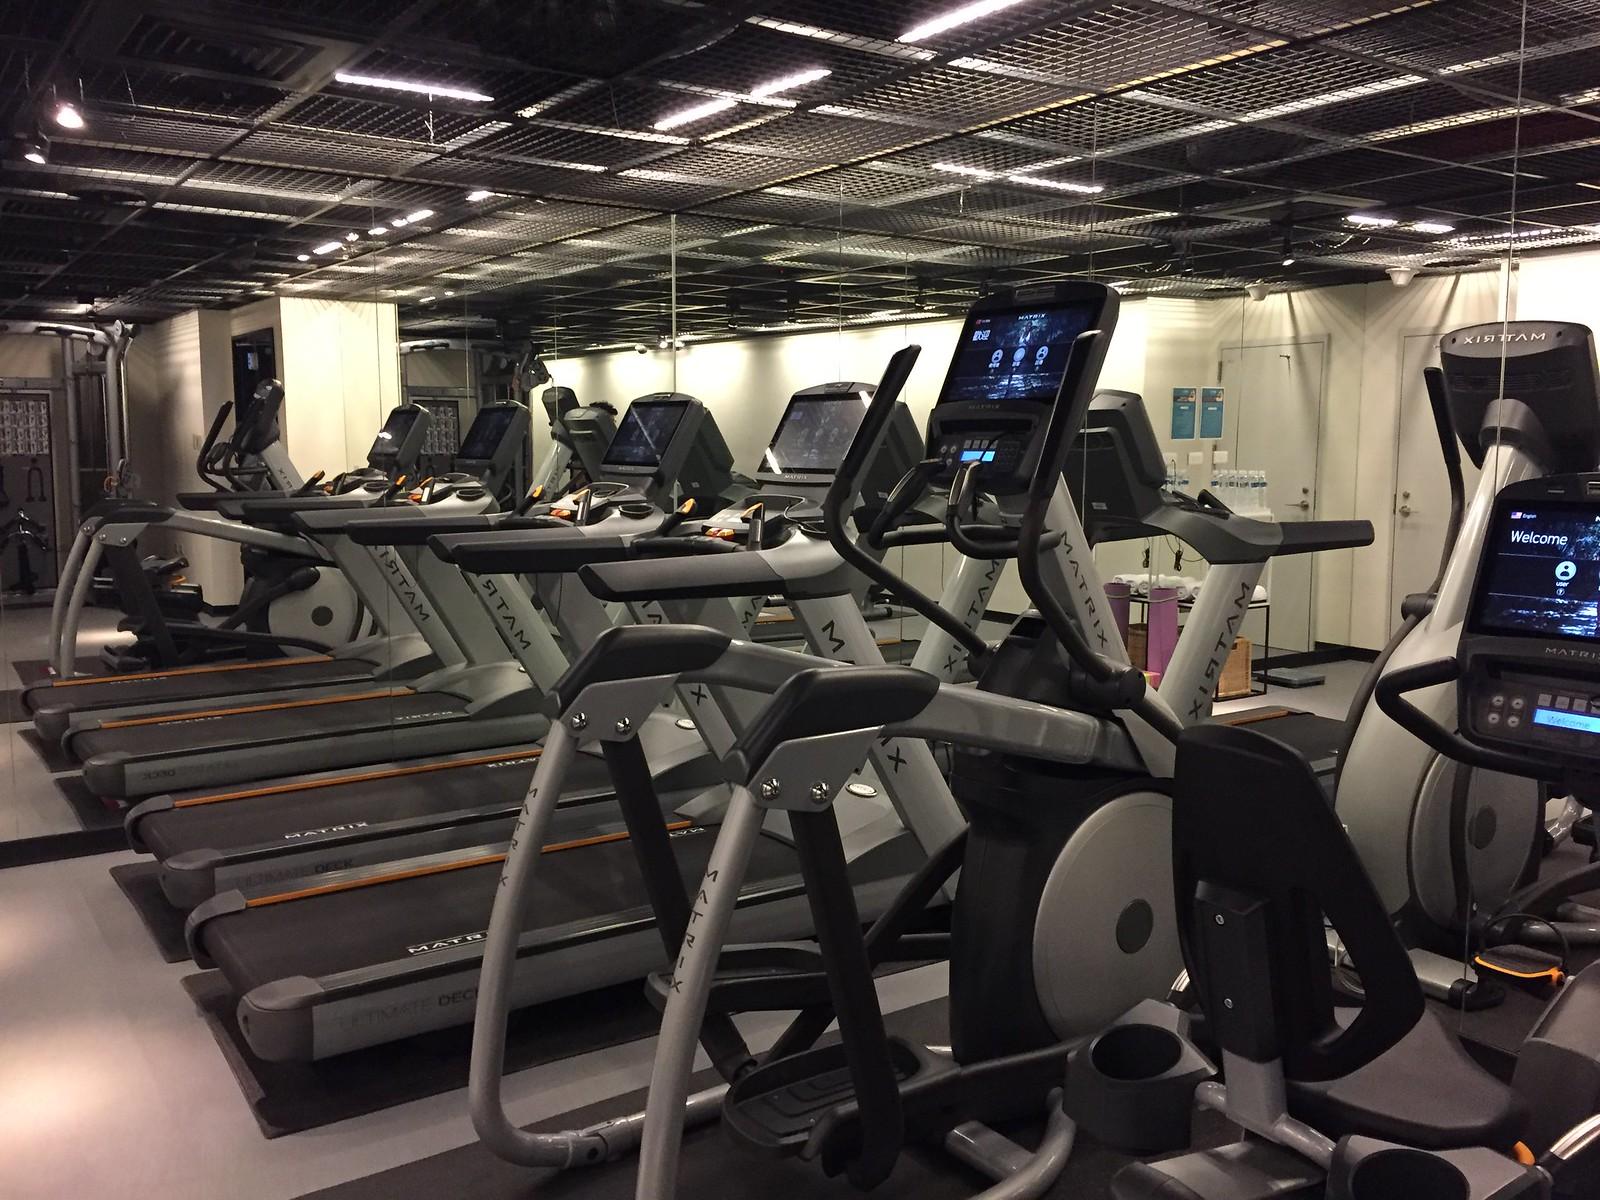 Amba Hotel Gym